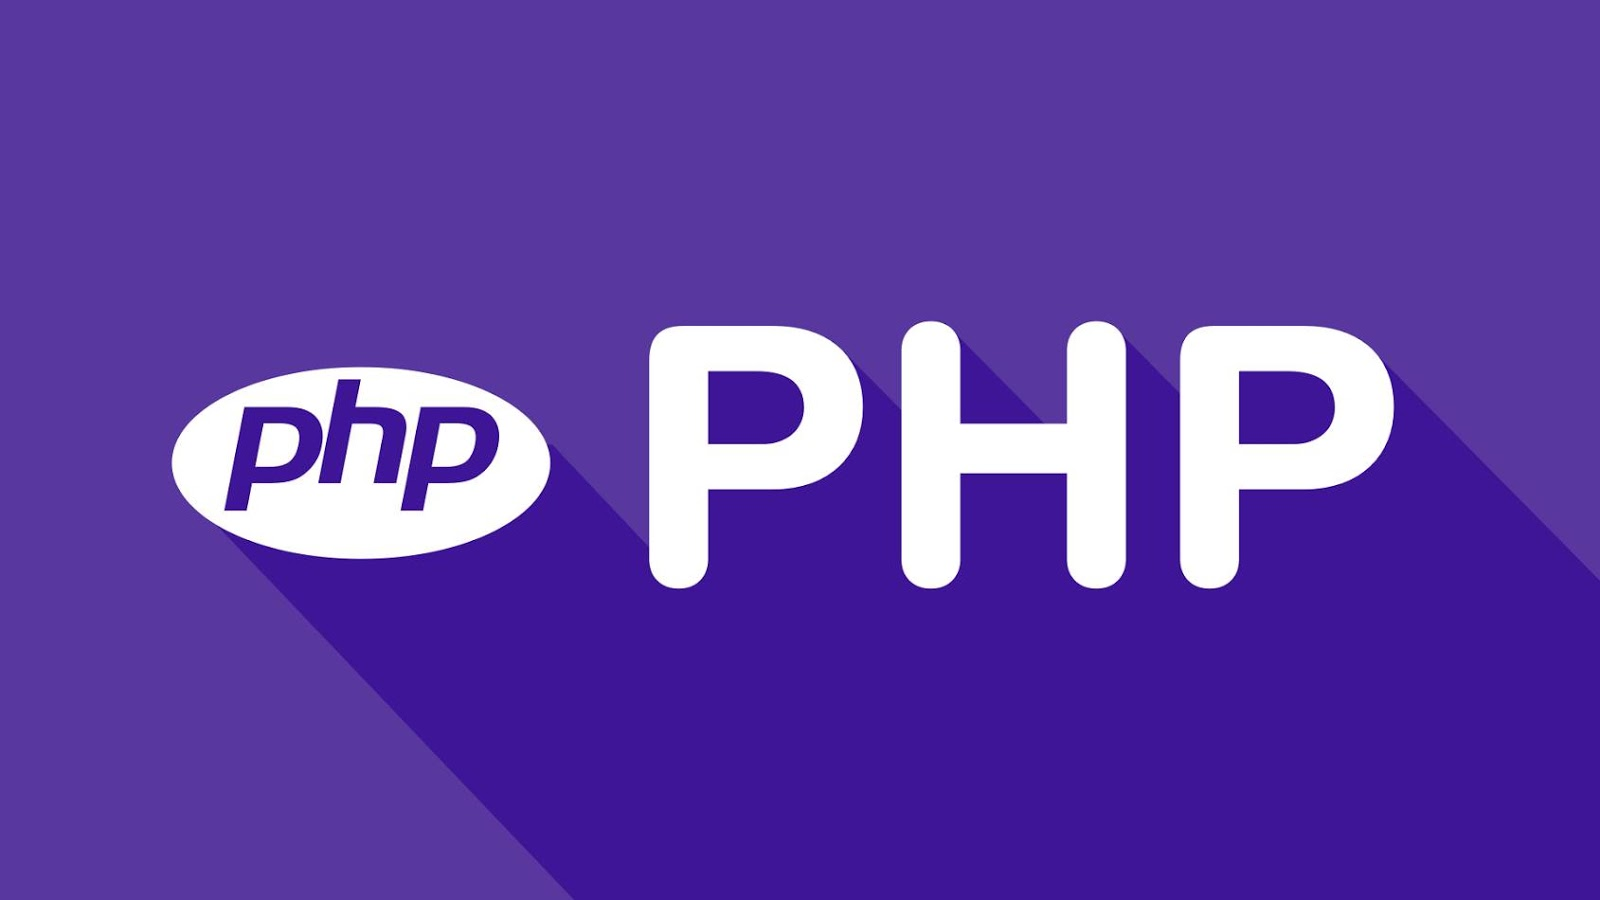 وێب دارشتن | 3كاتژمێر له فێركاری PHP بهكوردی